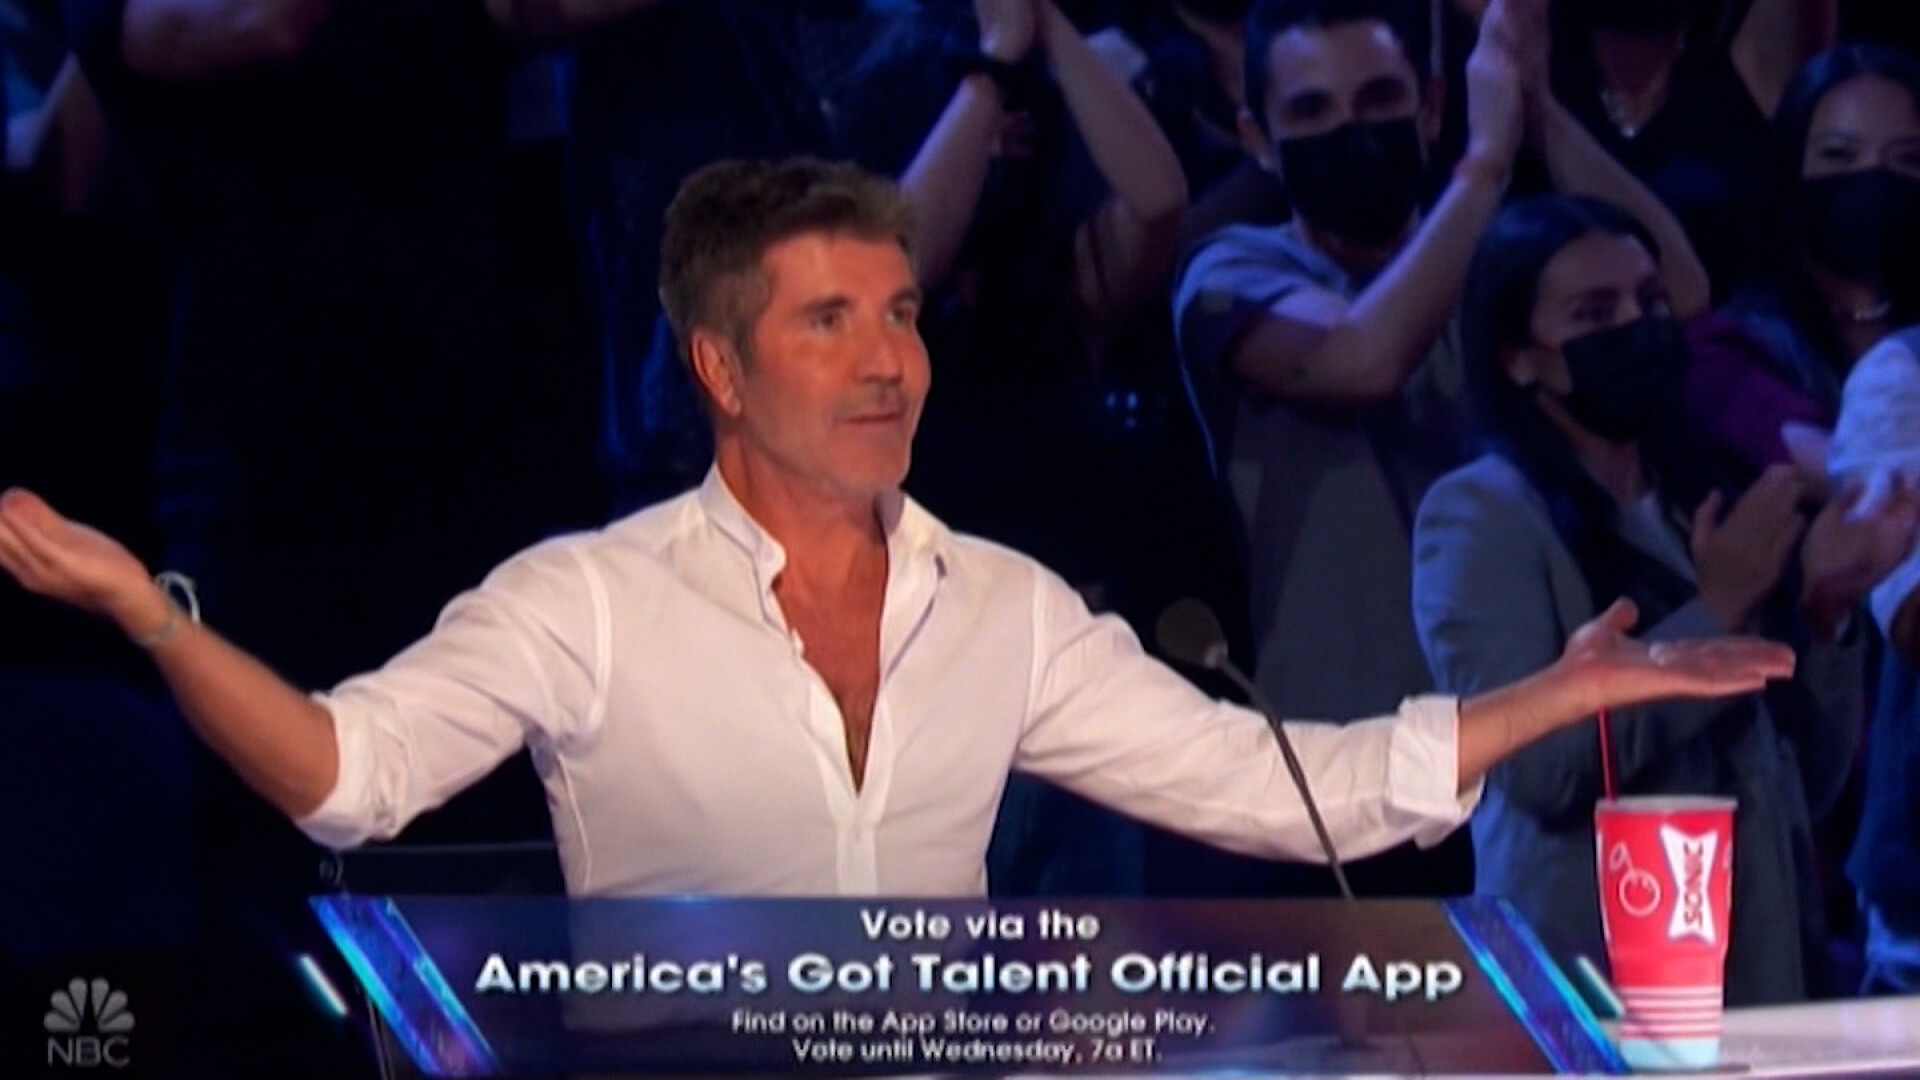 The winner of 'America's Got Talent' is …